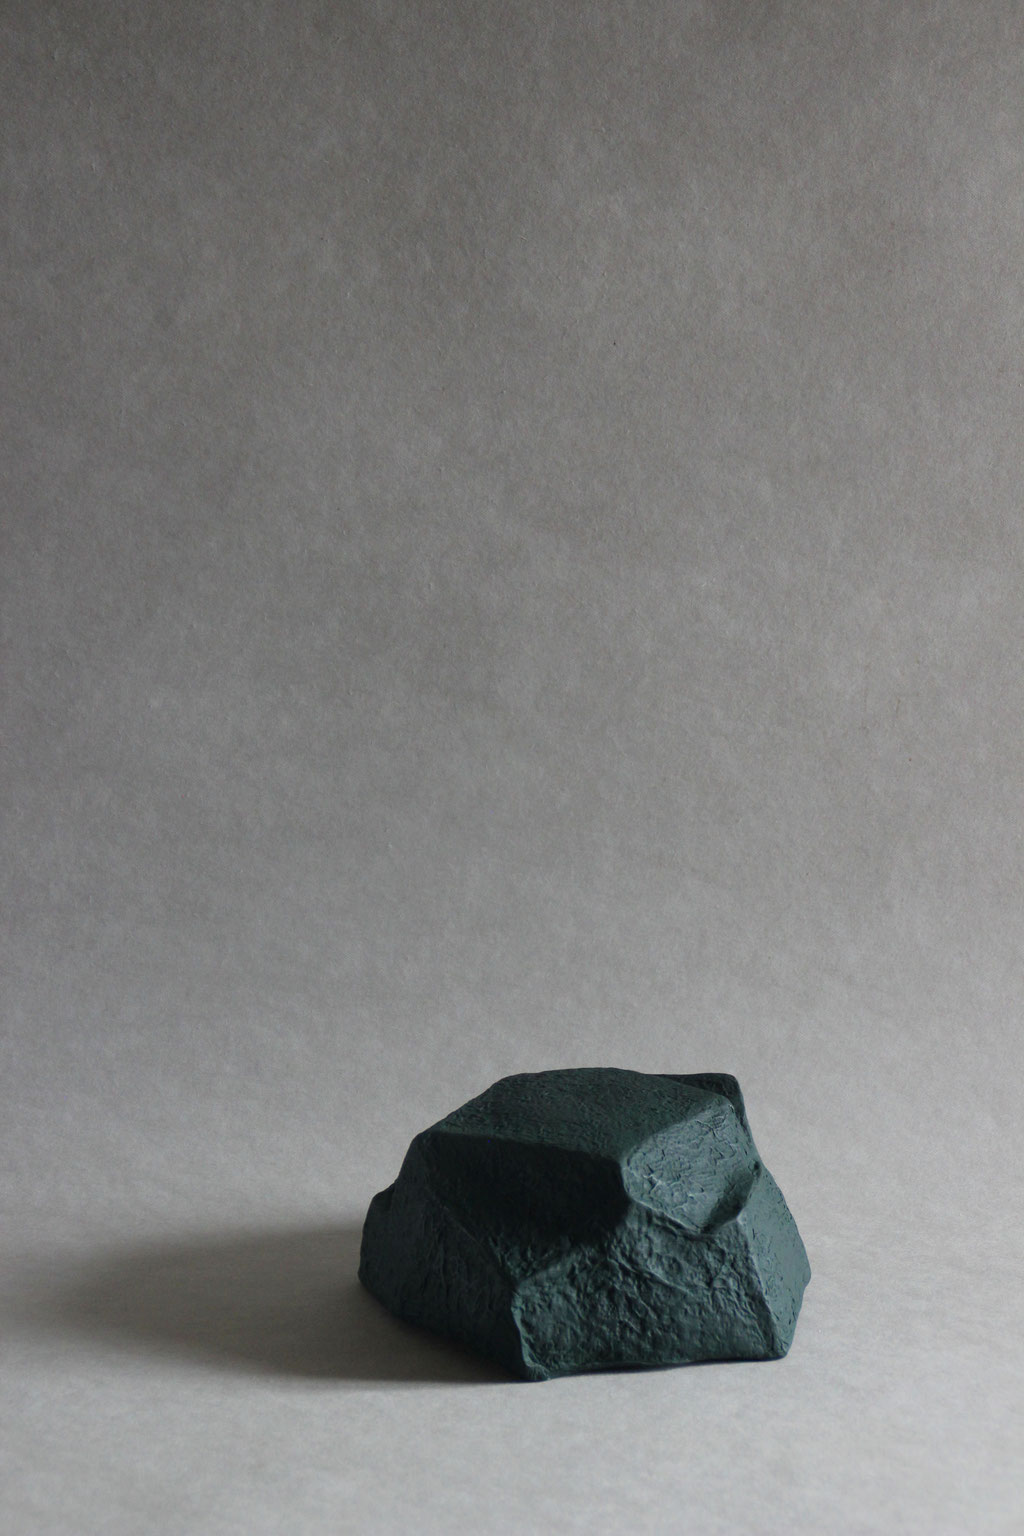 Caldera small forrest green